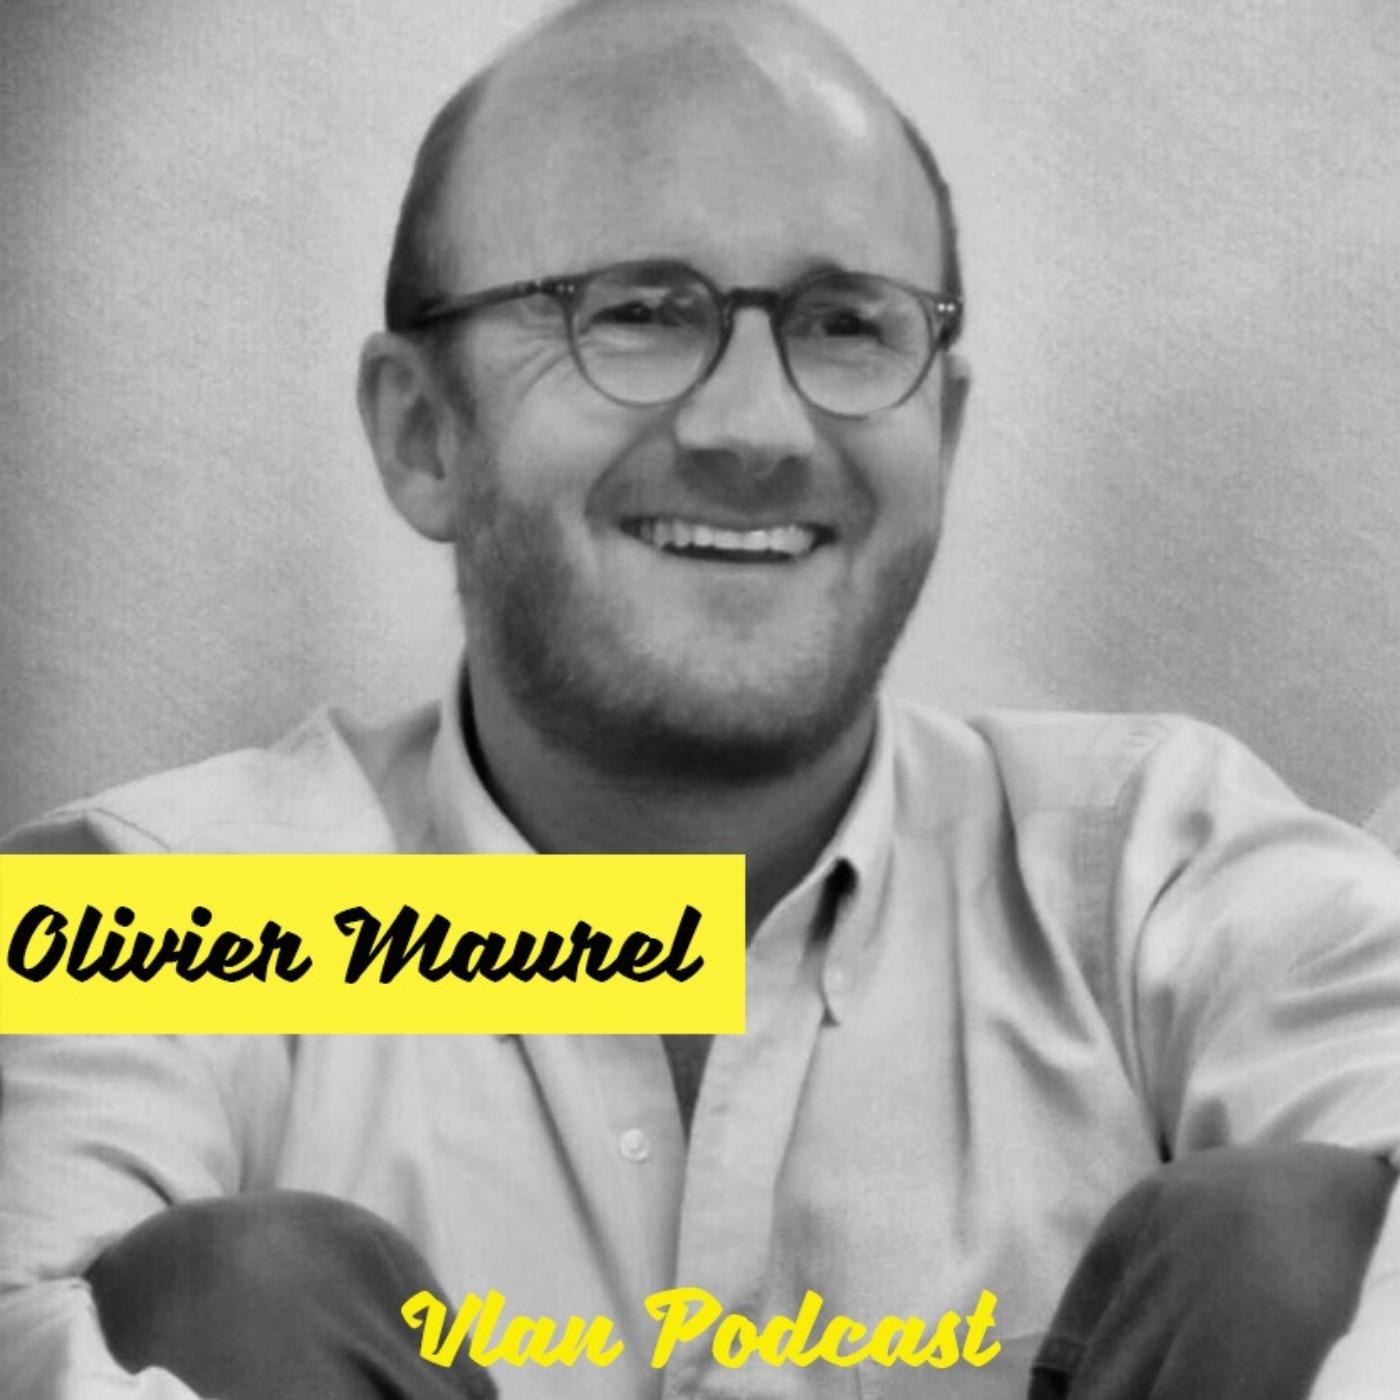 Vlan #84  Grand tournant écologique: soyons concret avec Olivier Maurel